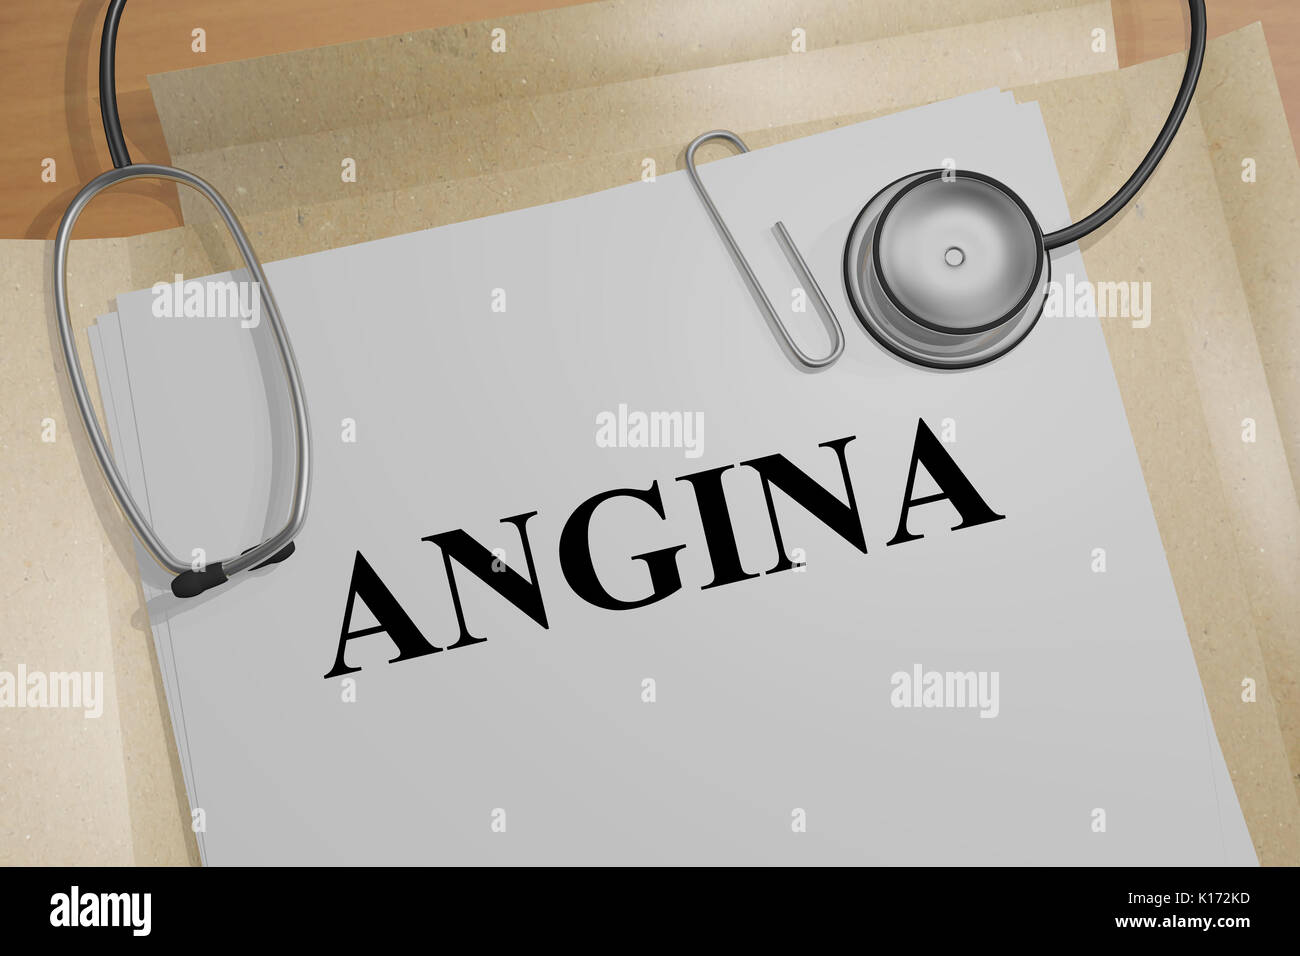 3D illustration of 'ANGINA' title on medical document - Stock Image